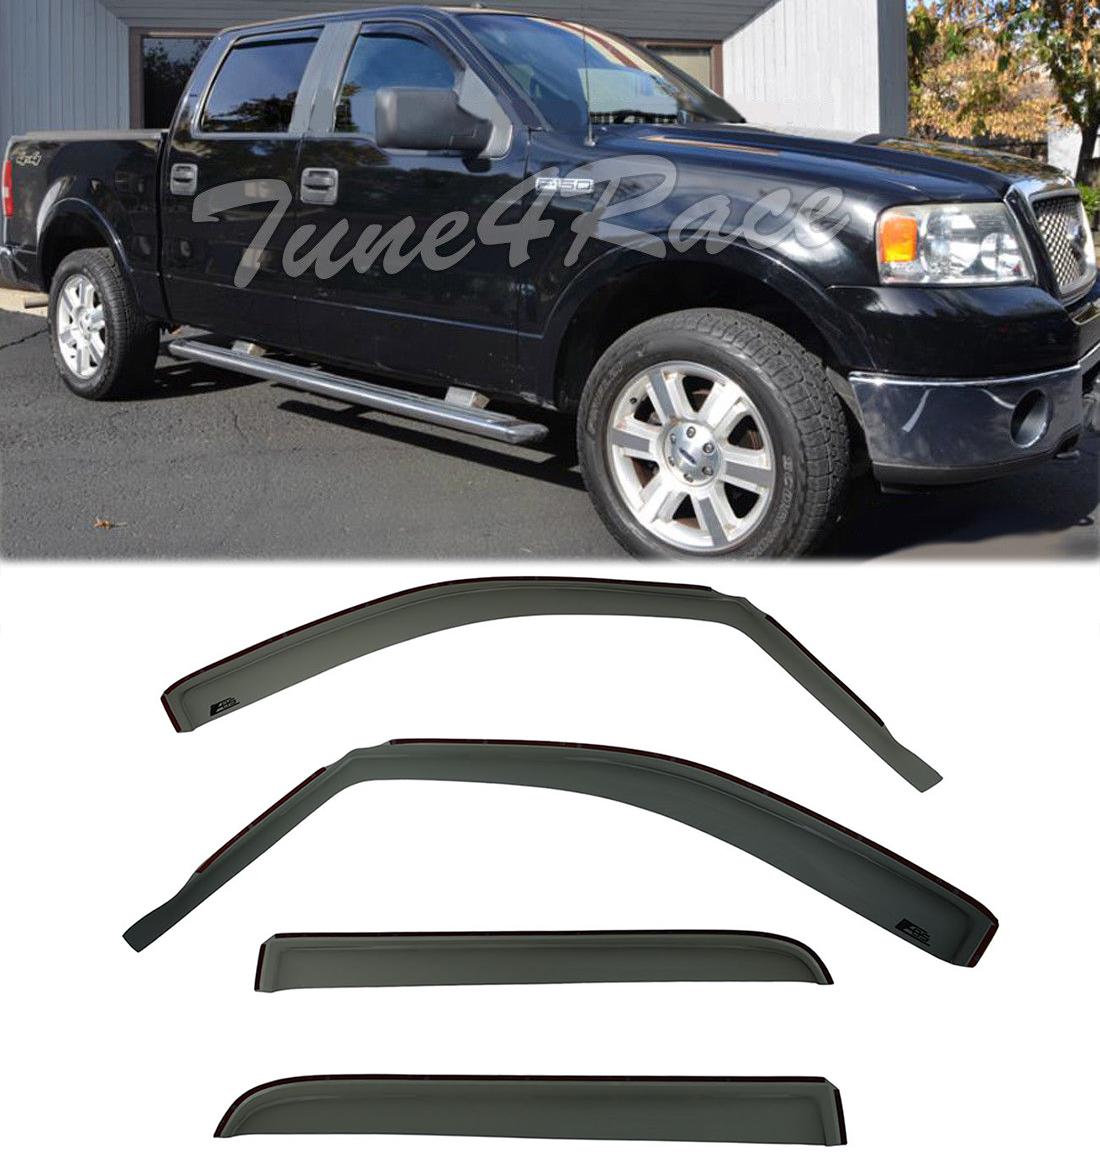 TrailFX Smoke TapeOn Rainguard Vent Visor Set For 04-08 Ford F-150 06-08 Mark LT